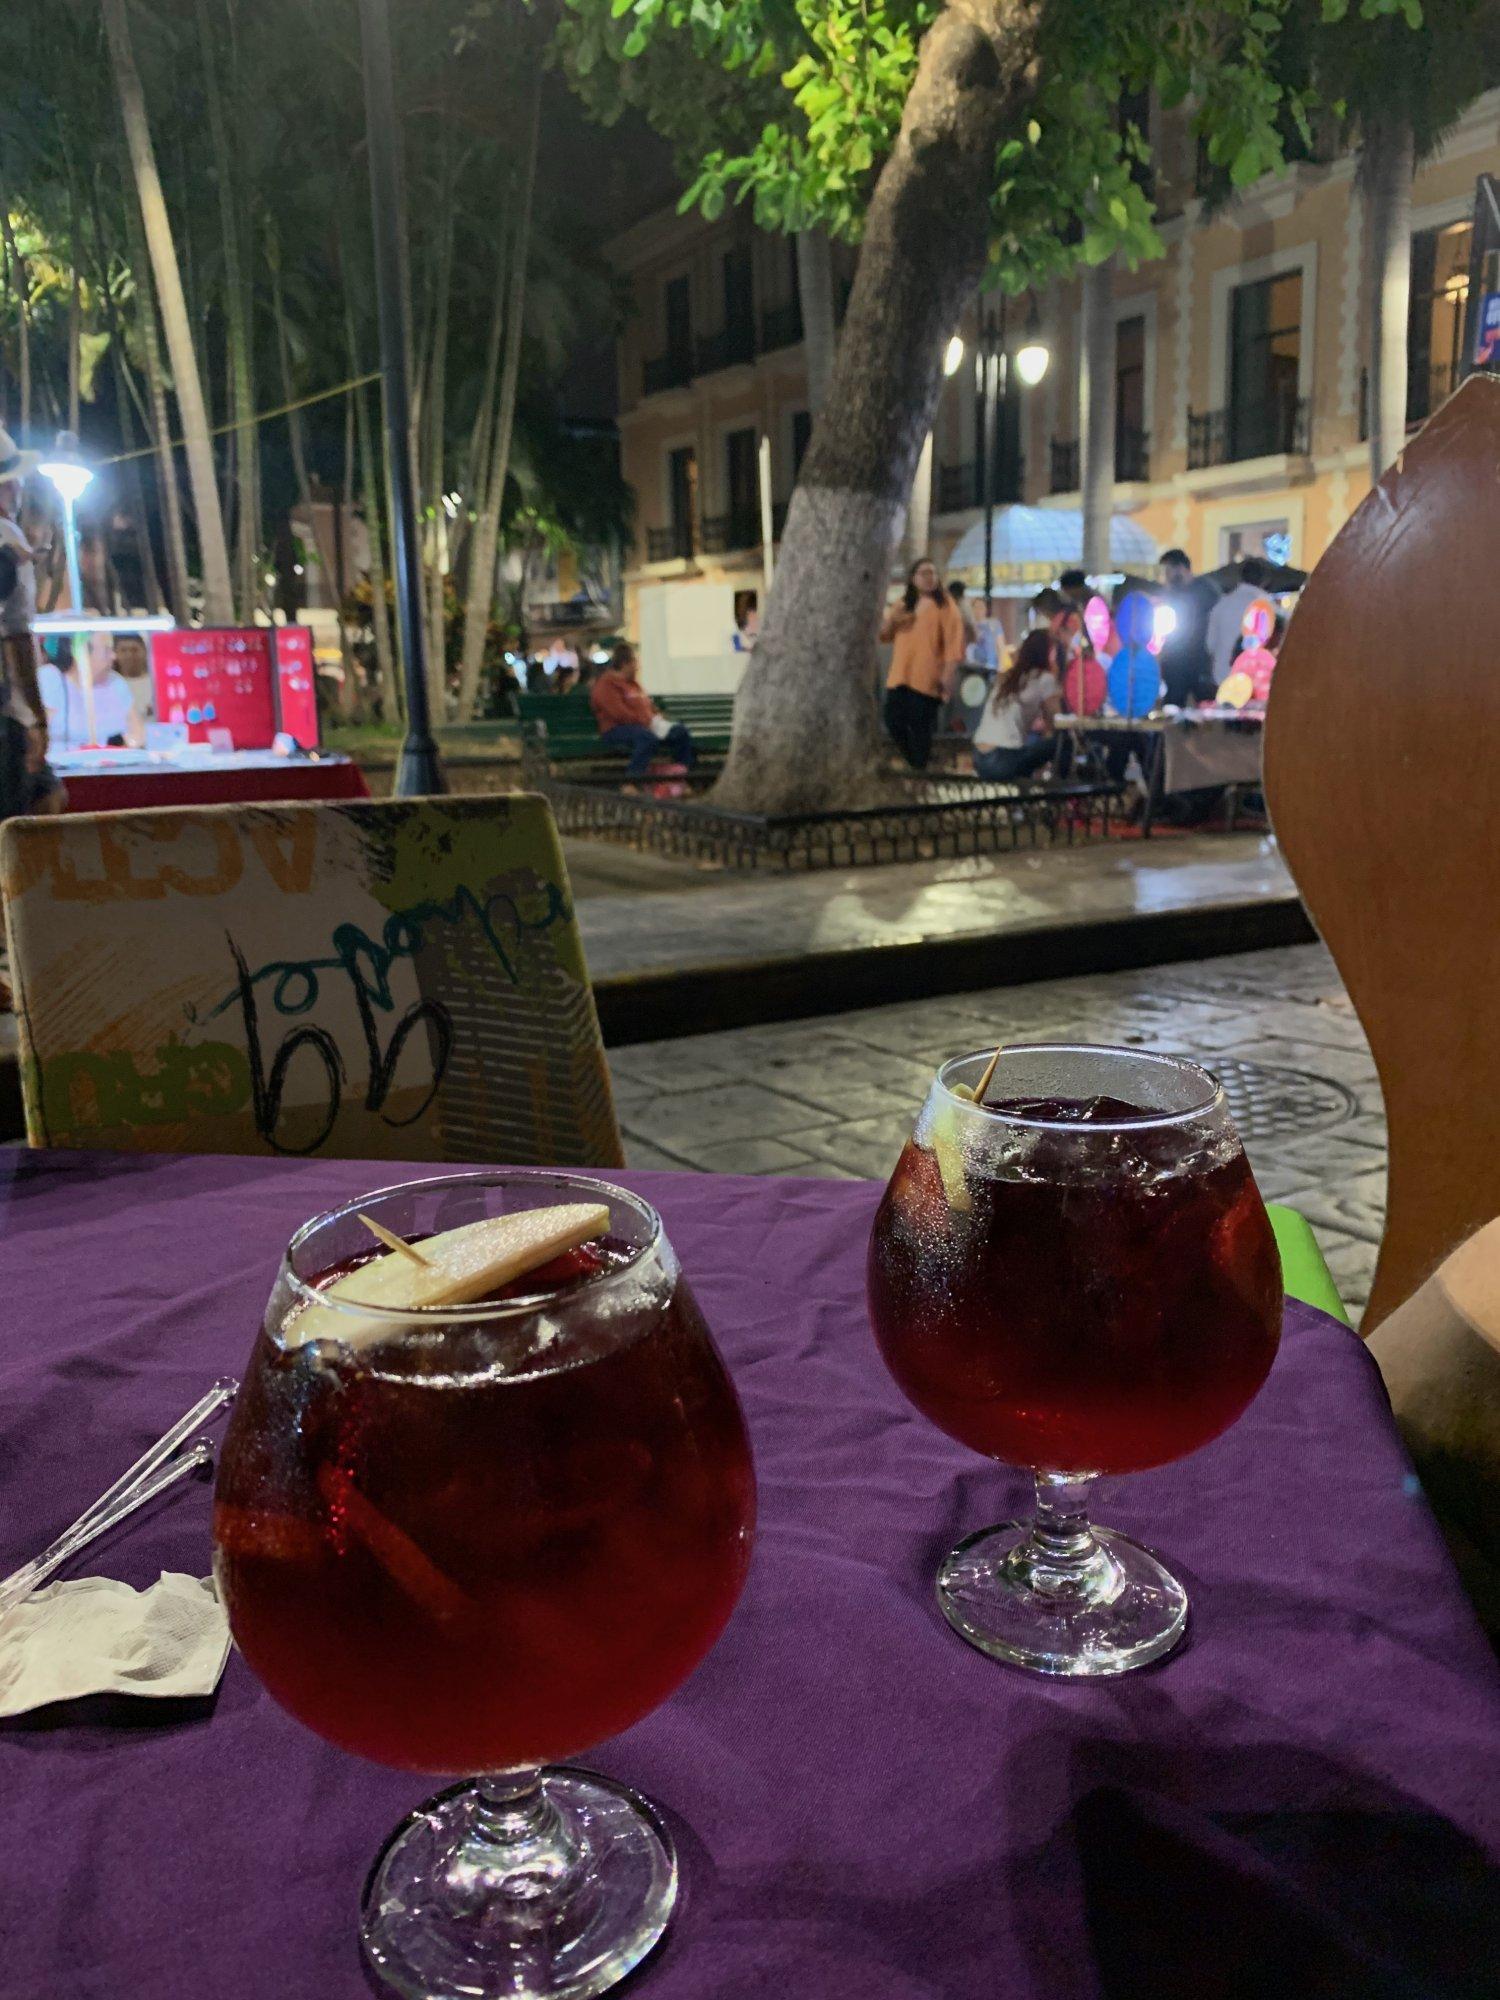 plaza drinks 1.31.2020.jpg